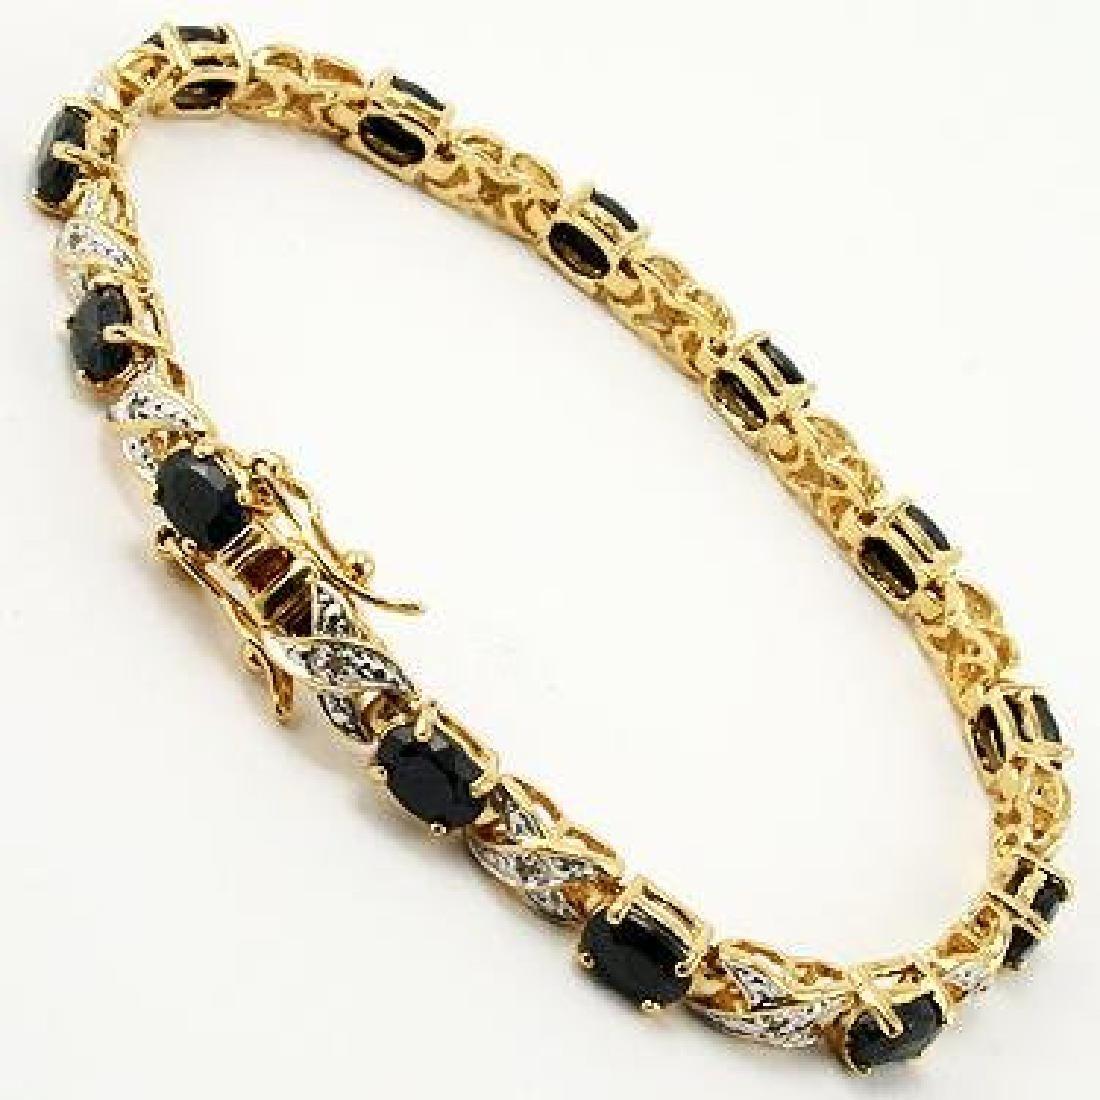 Amazing 12 CT Sapphire Diamond Bracelet